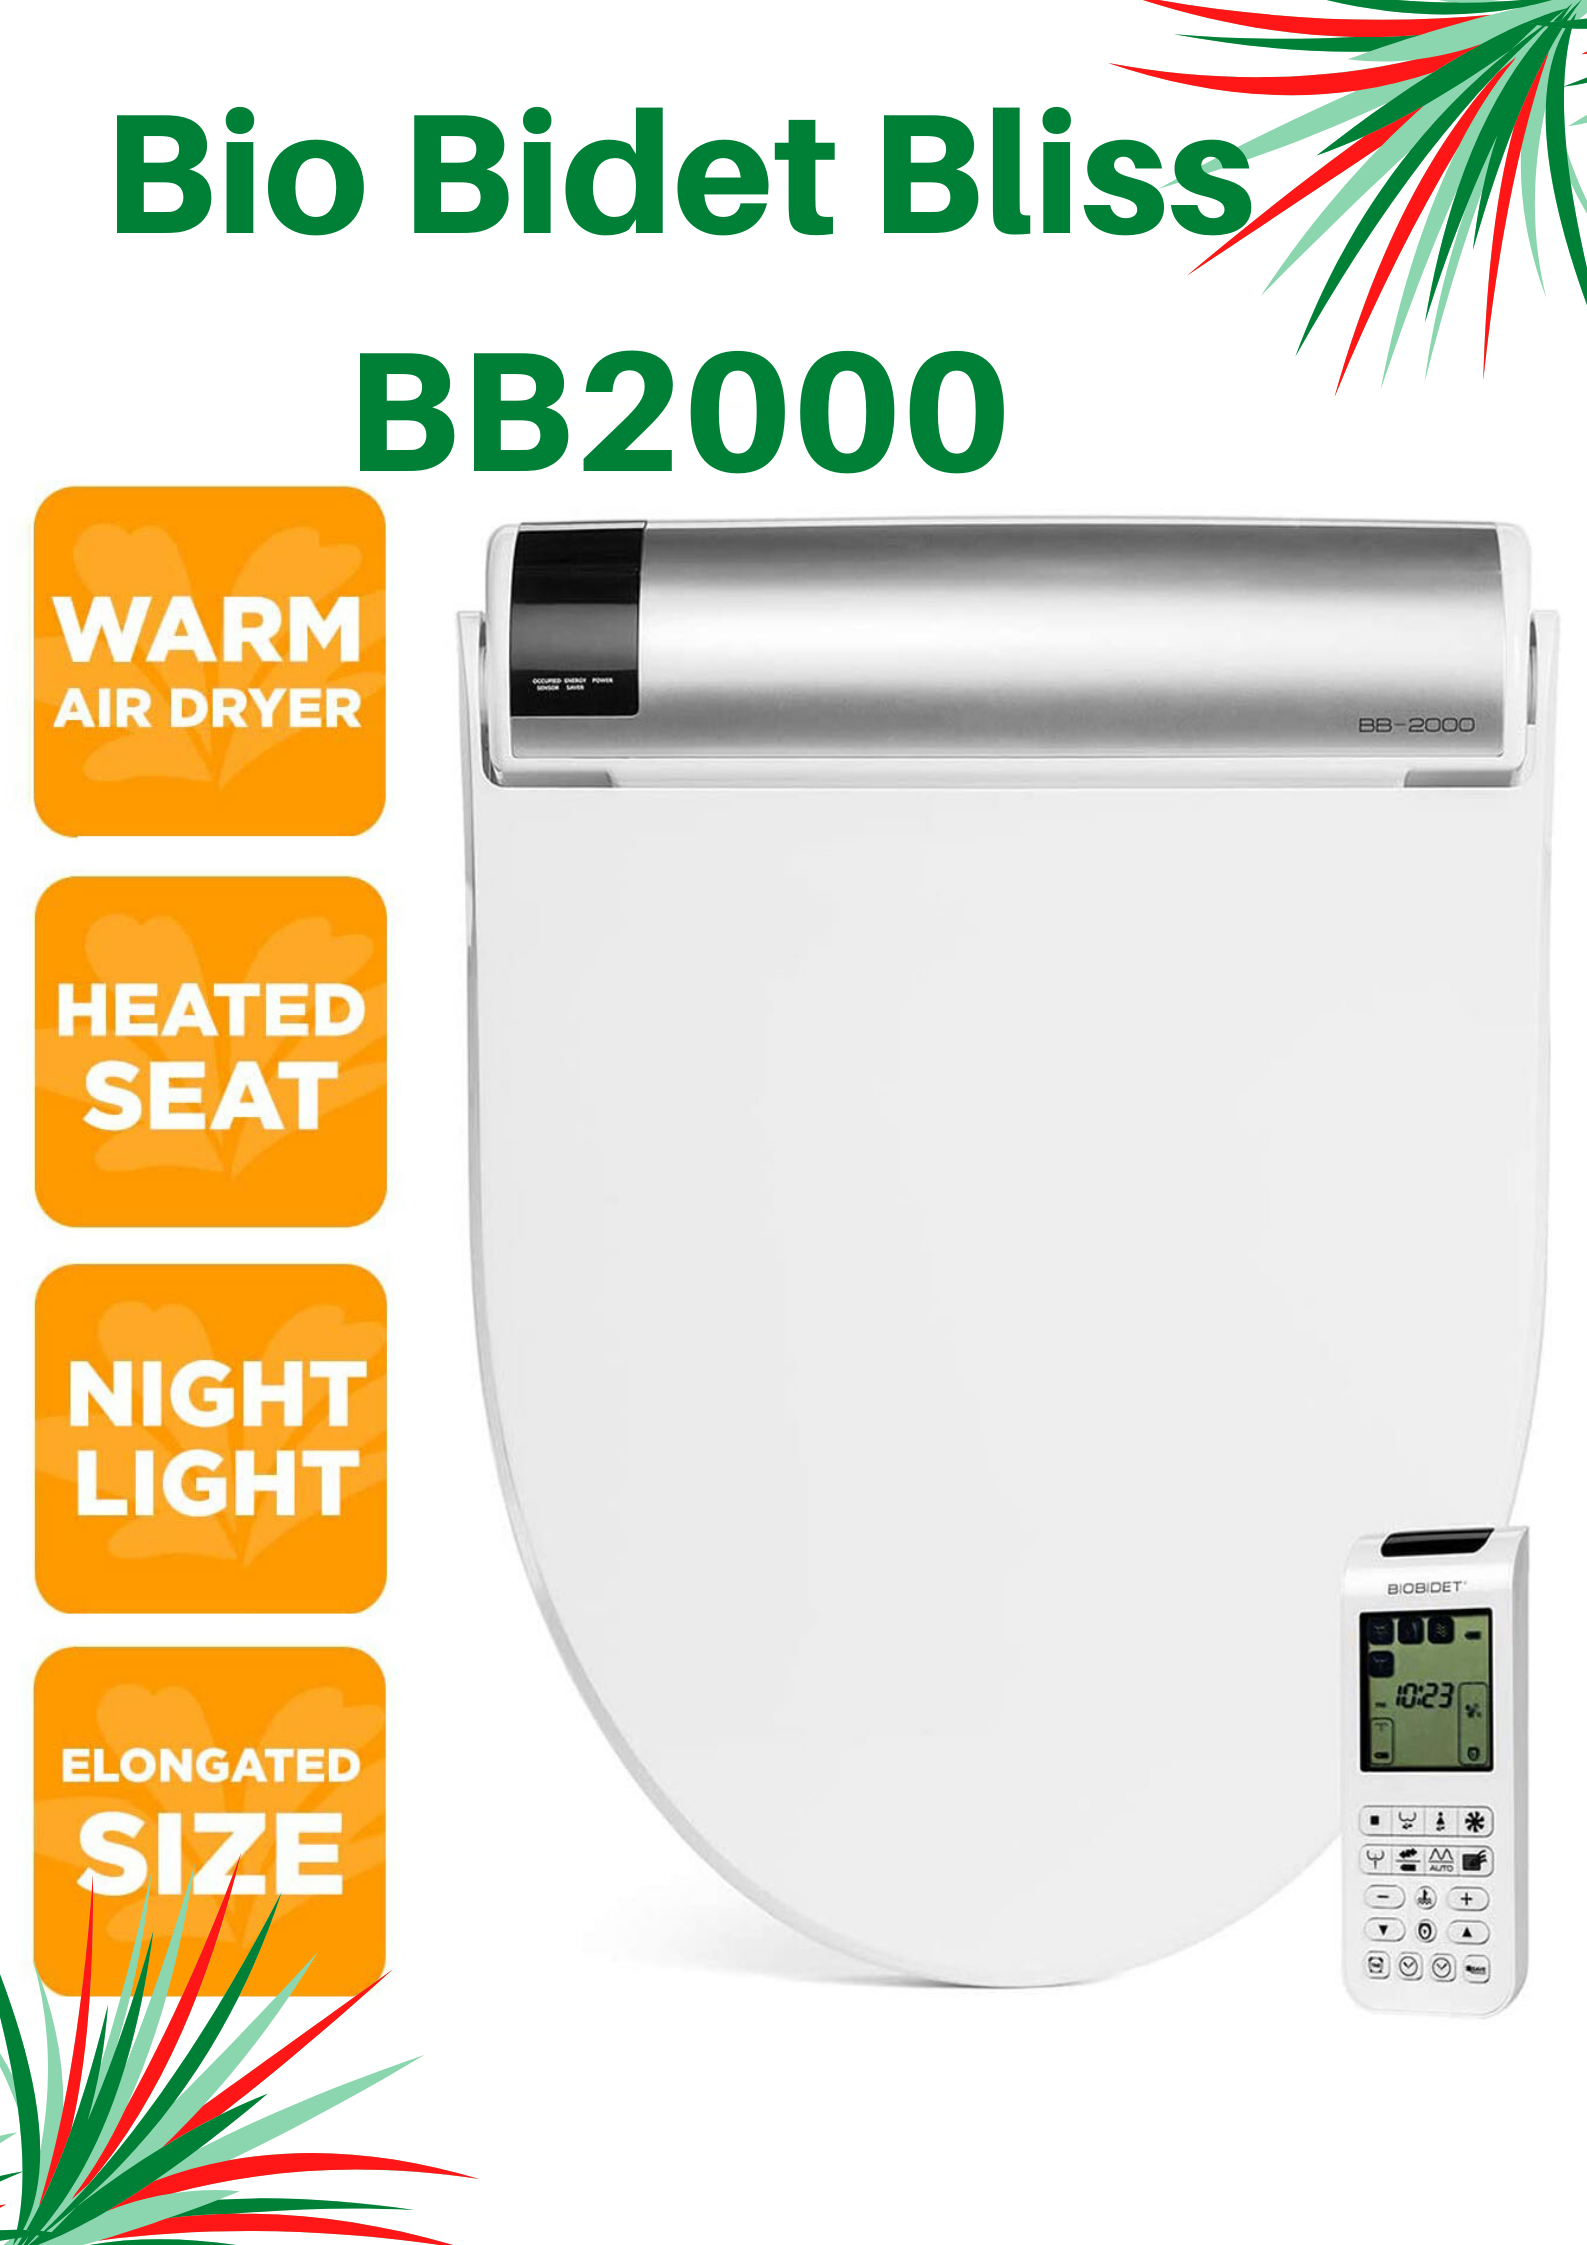 Biobidet Bliss Bb2000 Review In 2020 Elongated Toilet Seat Biobidet Smart Toilet